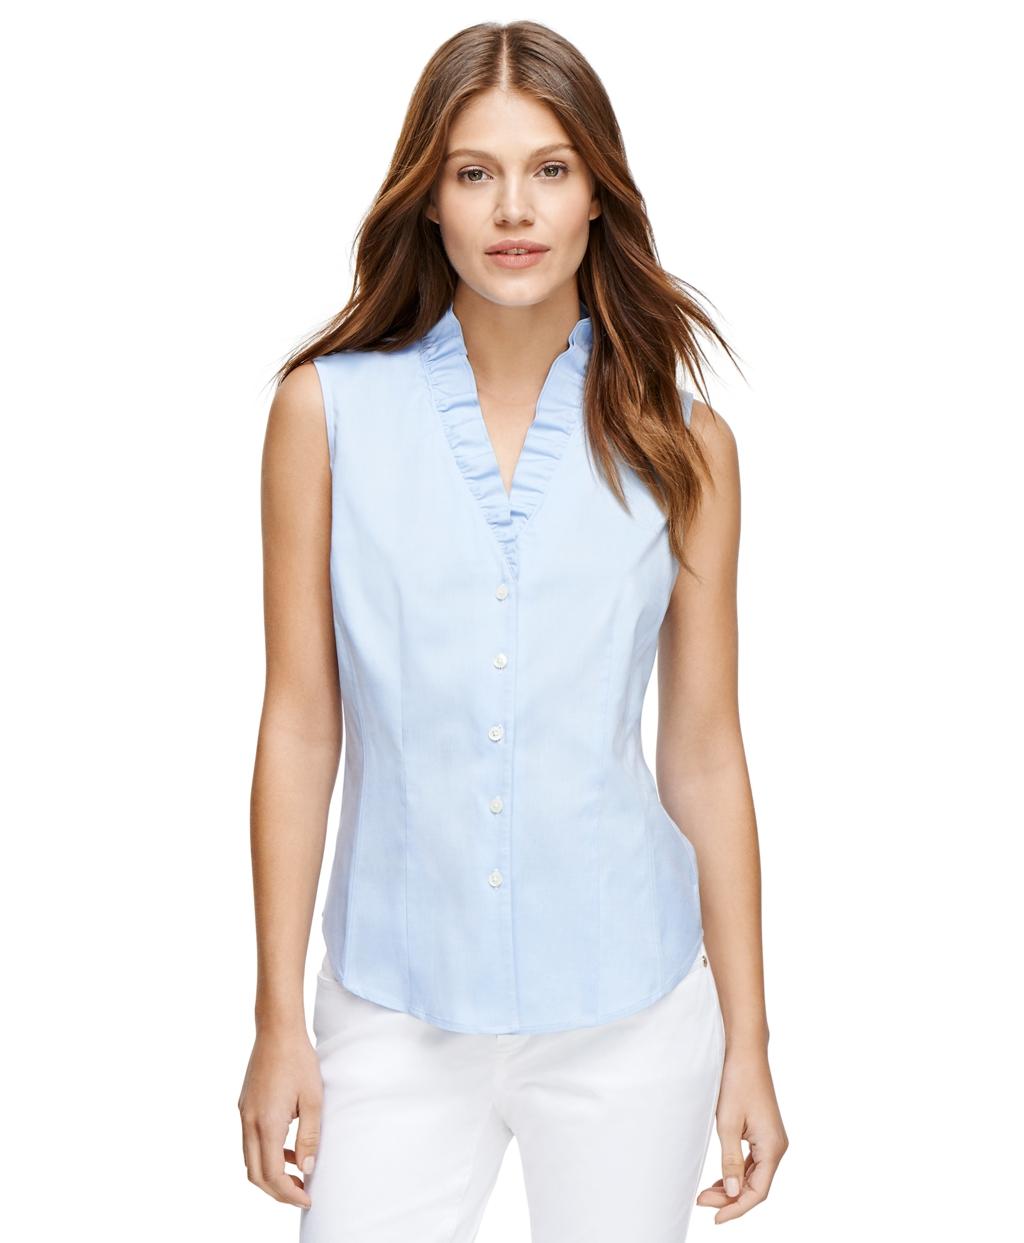 Foxcroft Womens Shirts